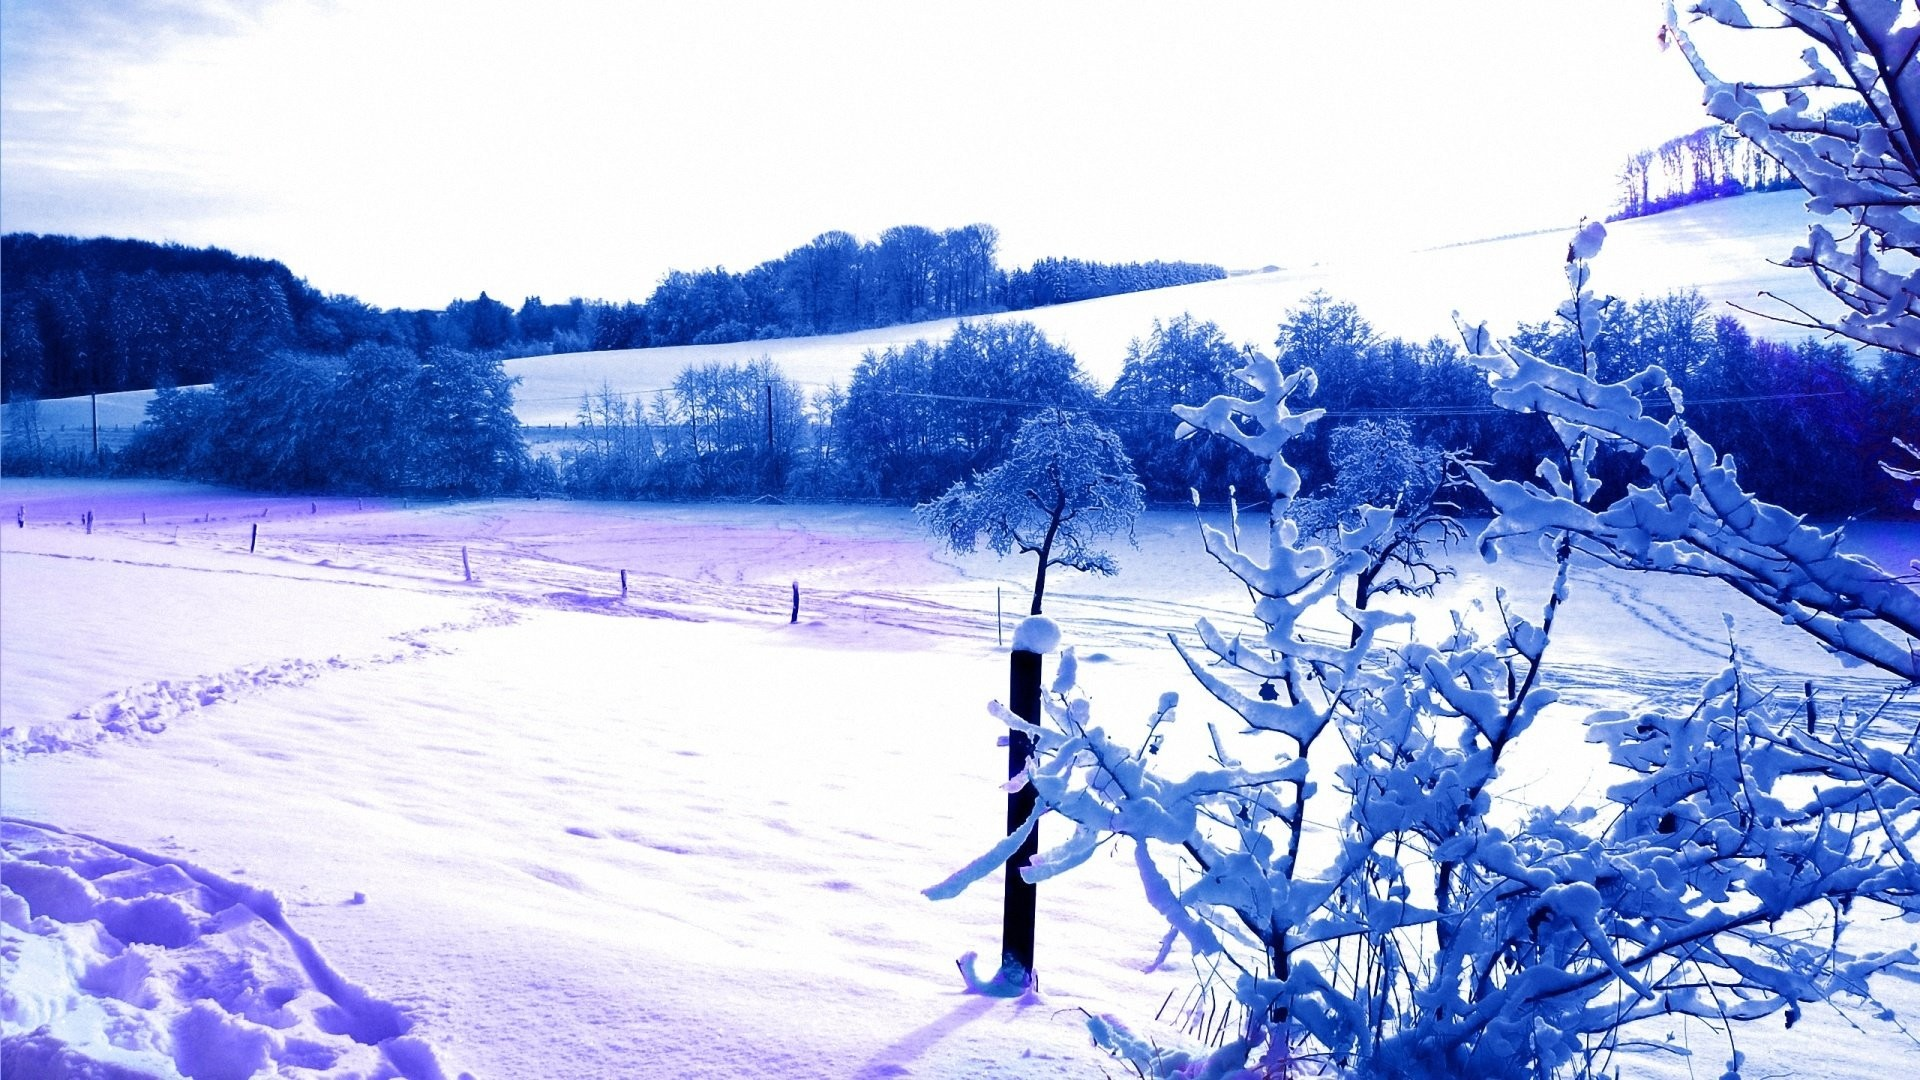 Winters Snow Forest Original Zima Gdefon 763198